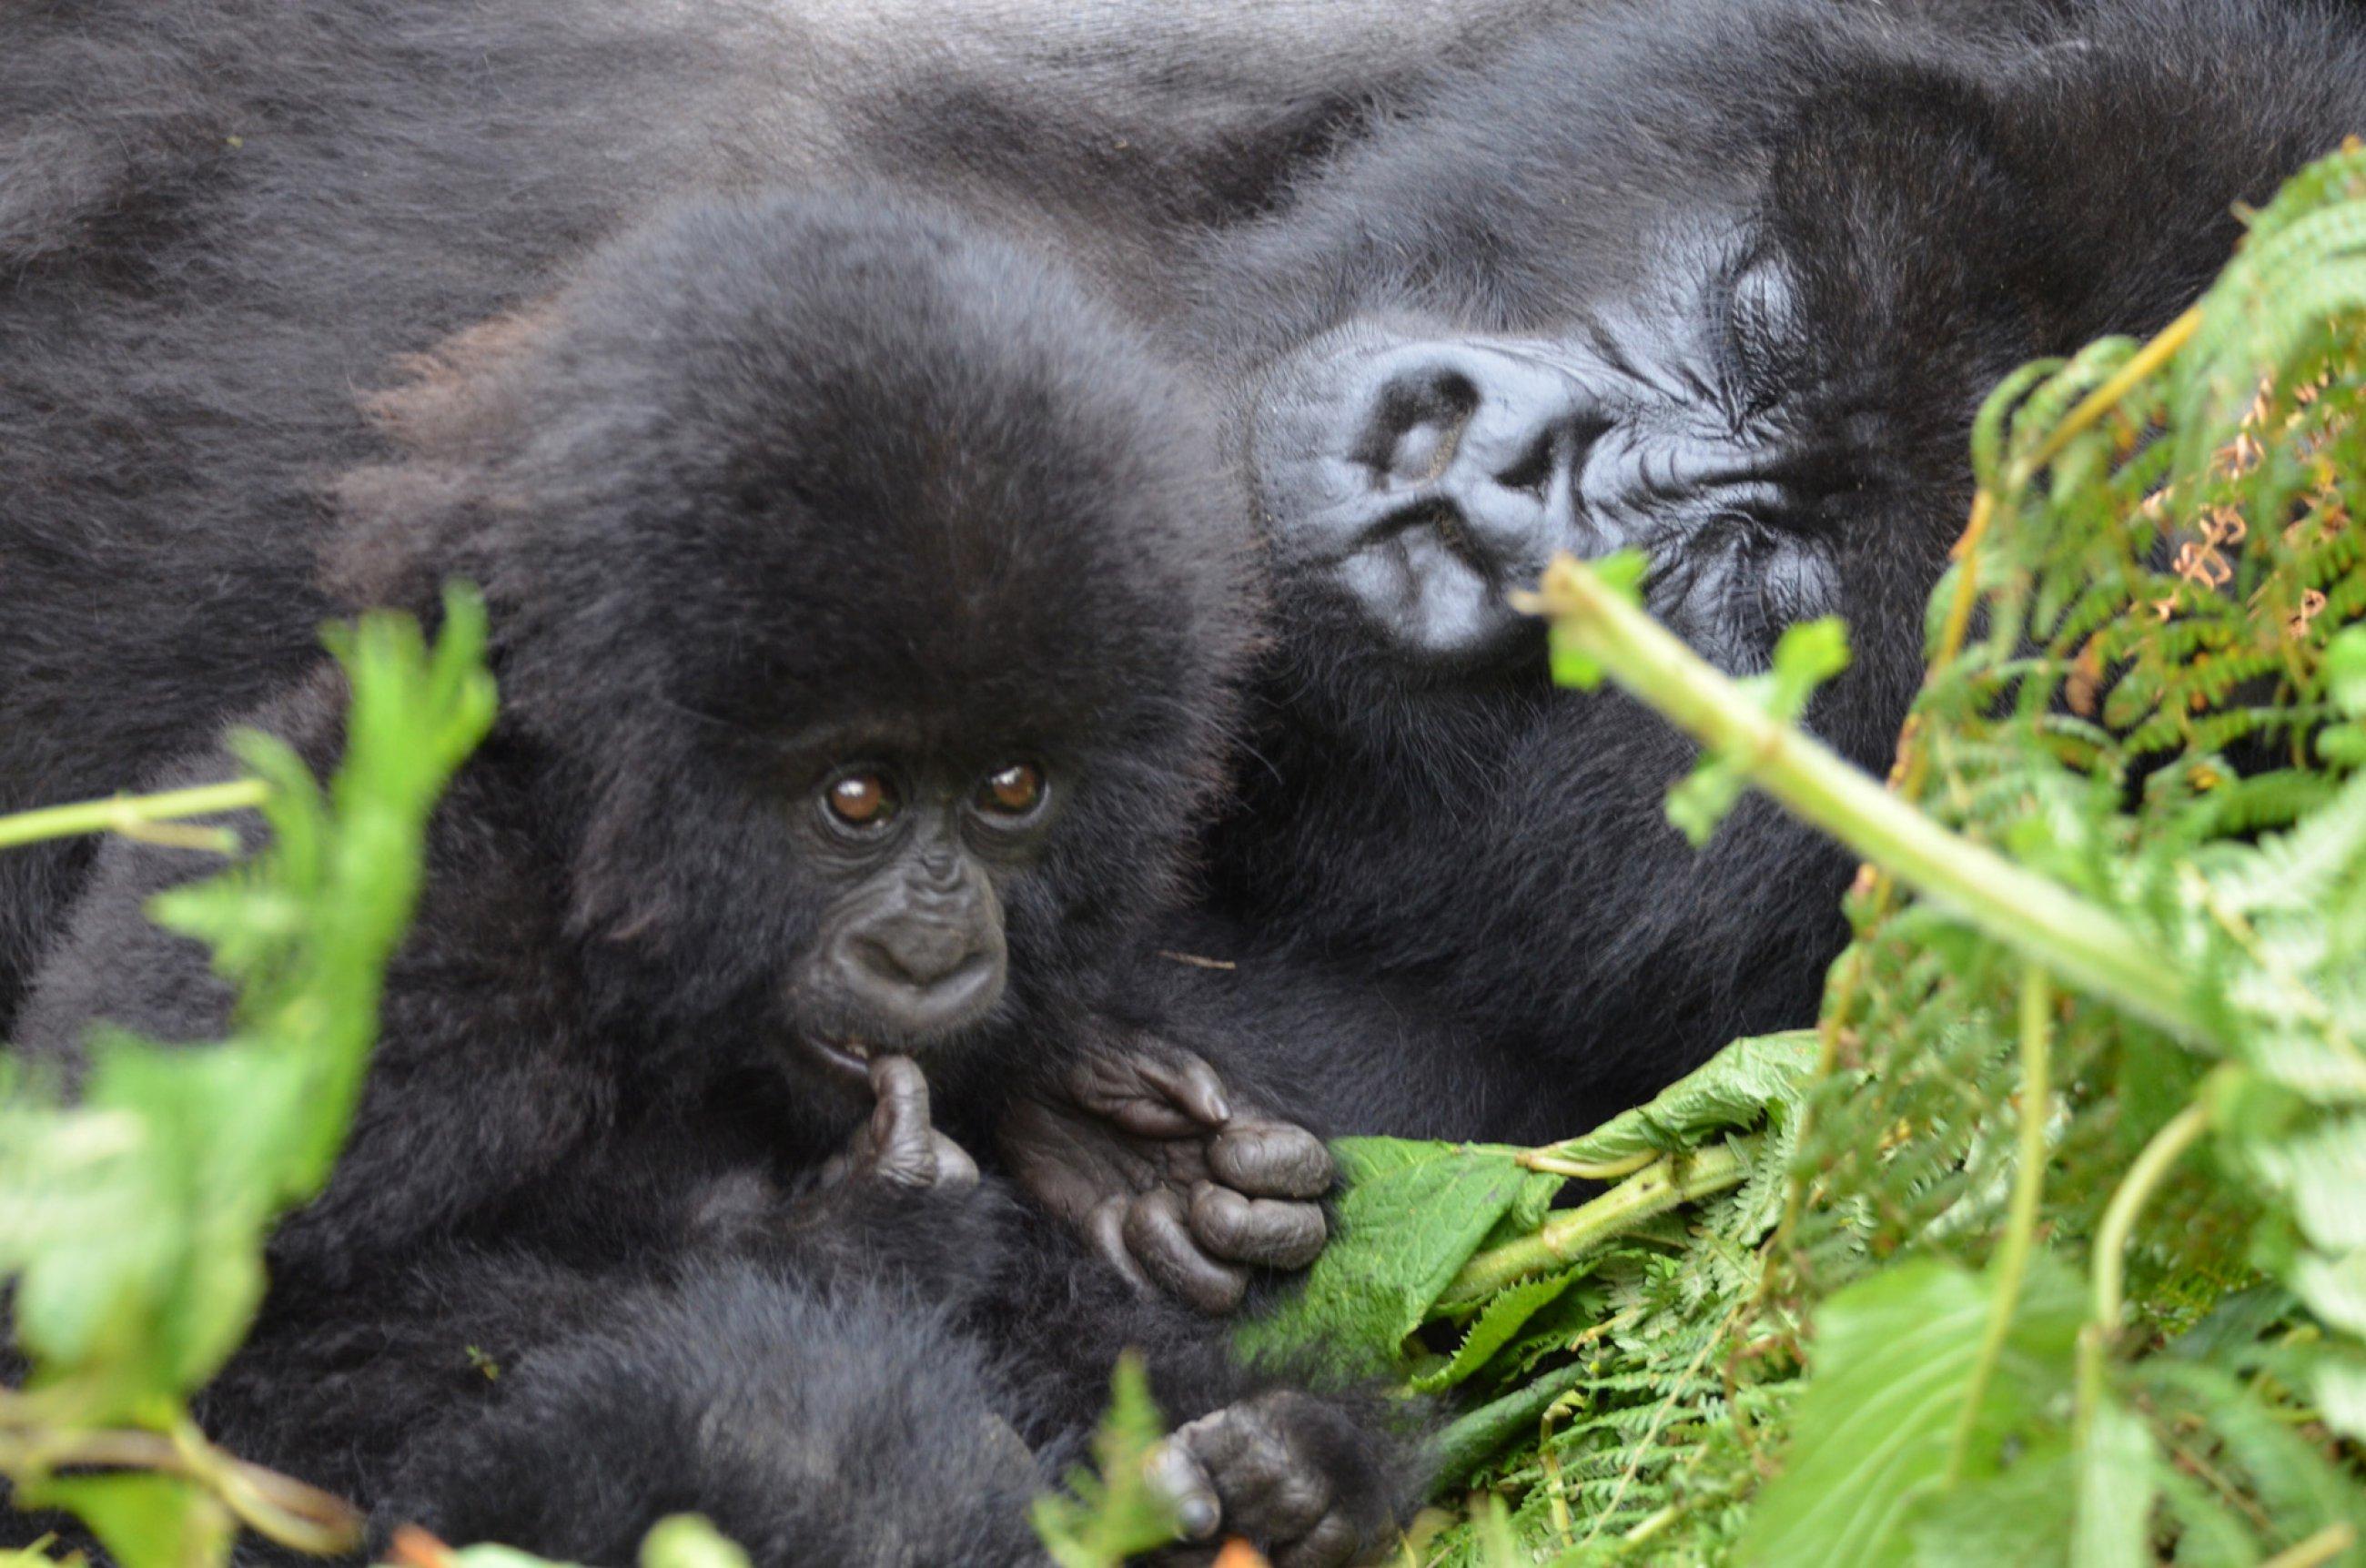 https://bubo.sk/uploads/galleries/4986/burundi-rwanda-uganda-kongo-martin-karnis-4032-3-.jpg